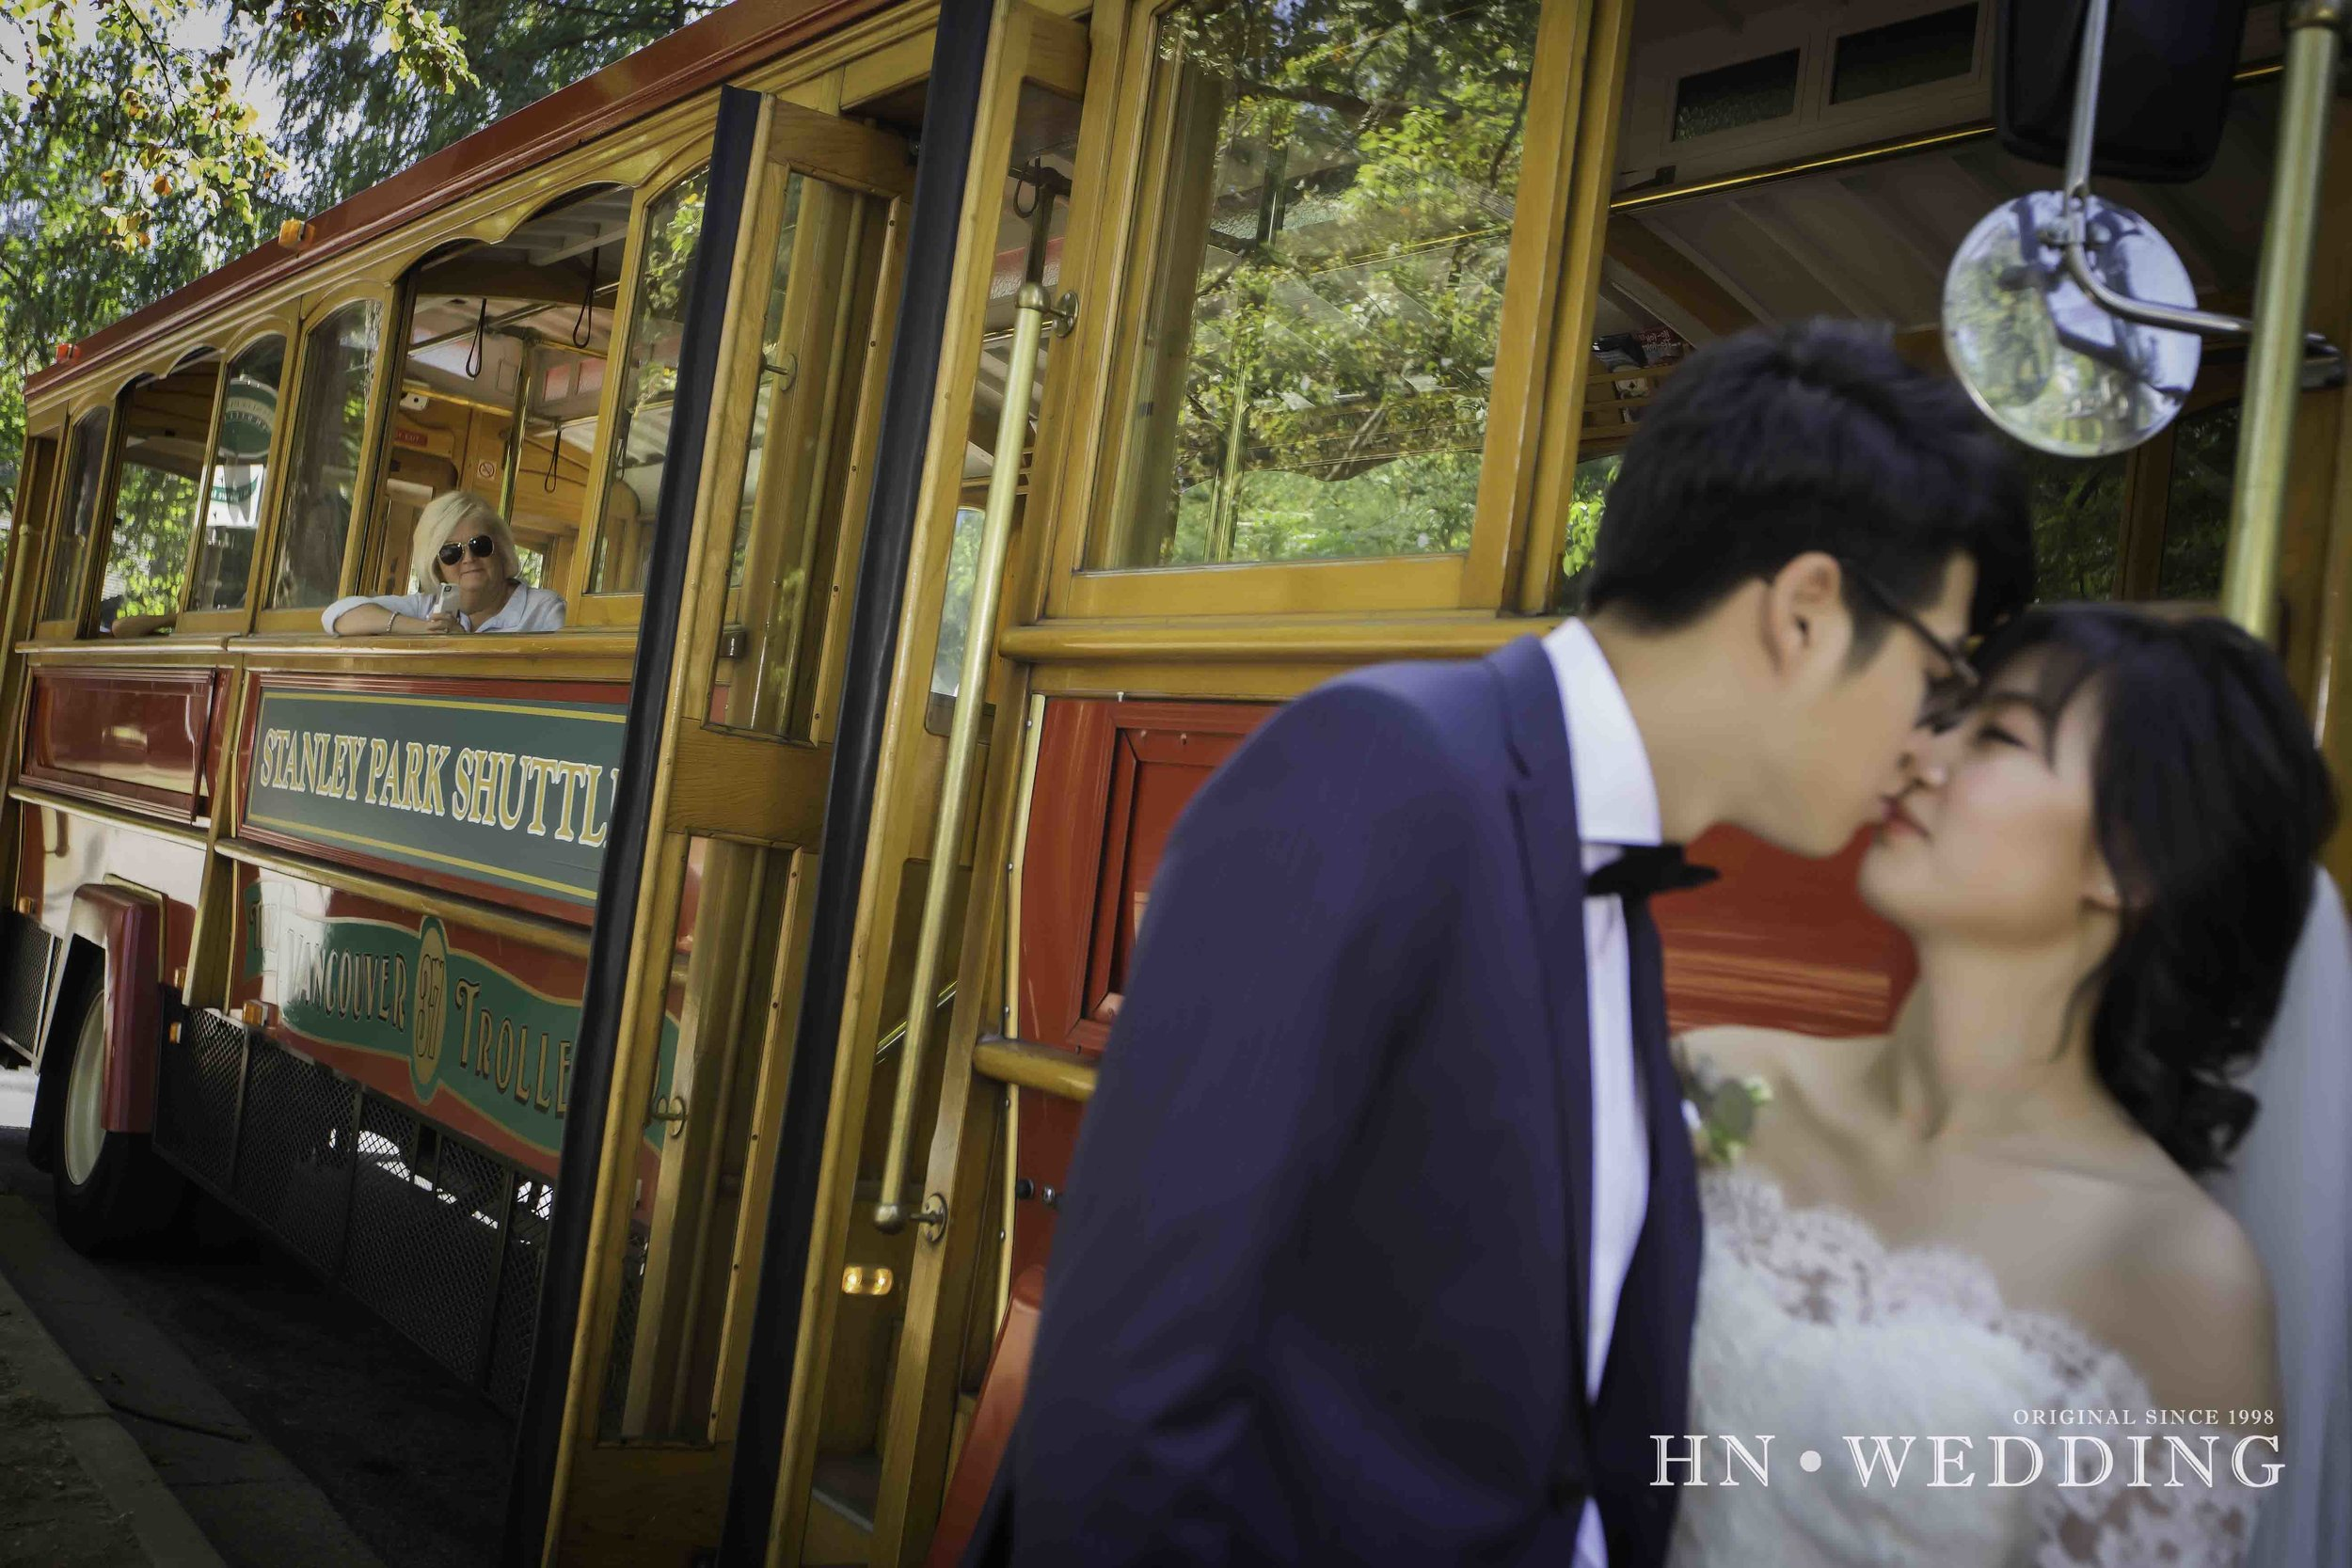 HNwedding-20160826-wedding-1569.jpg